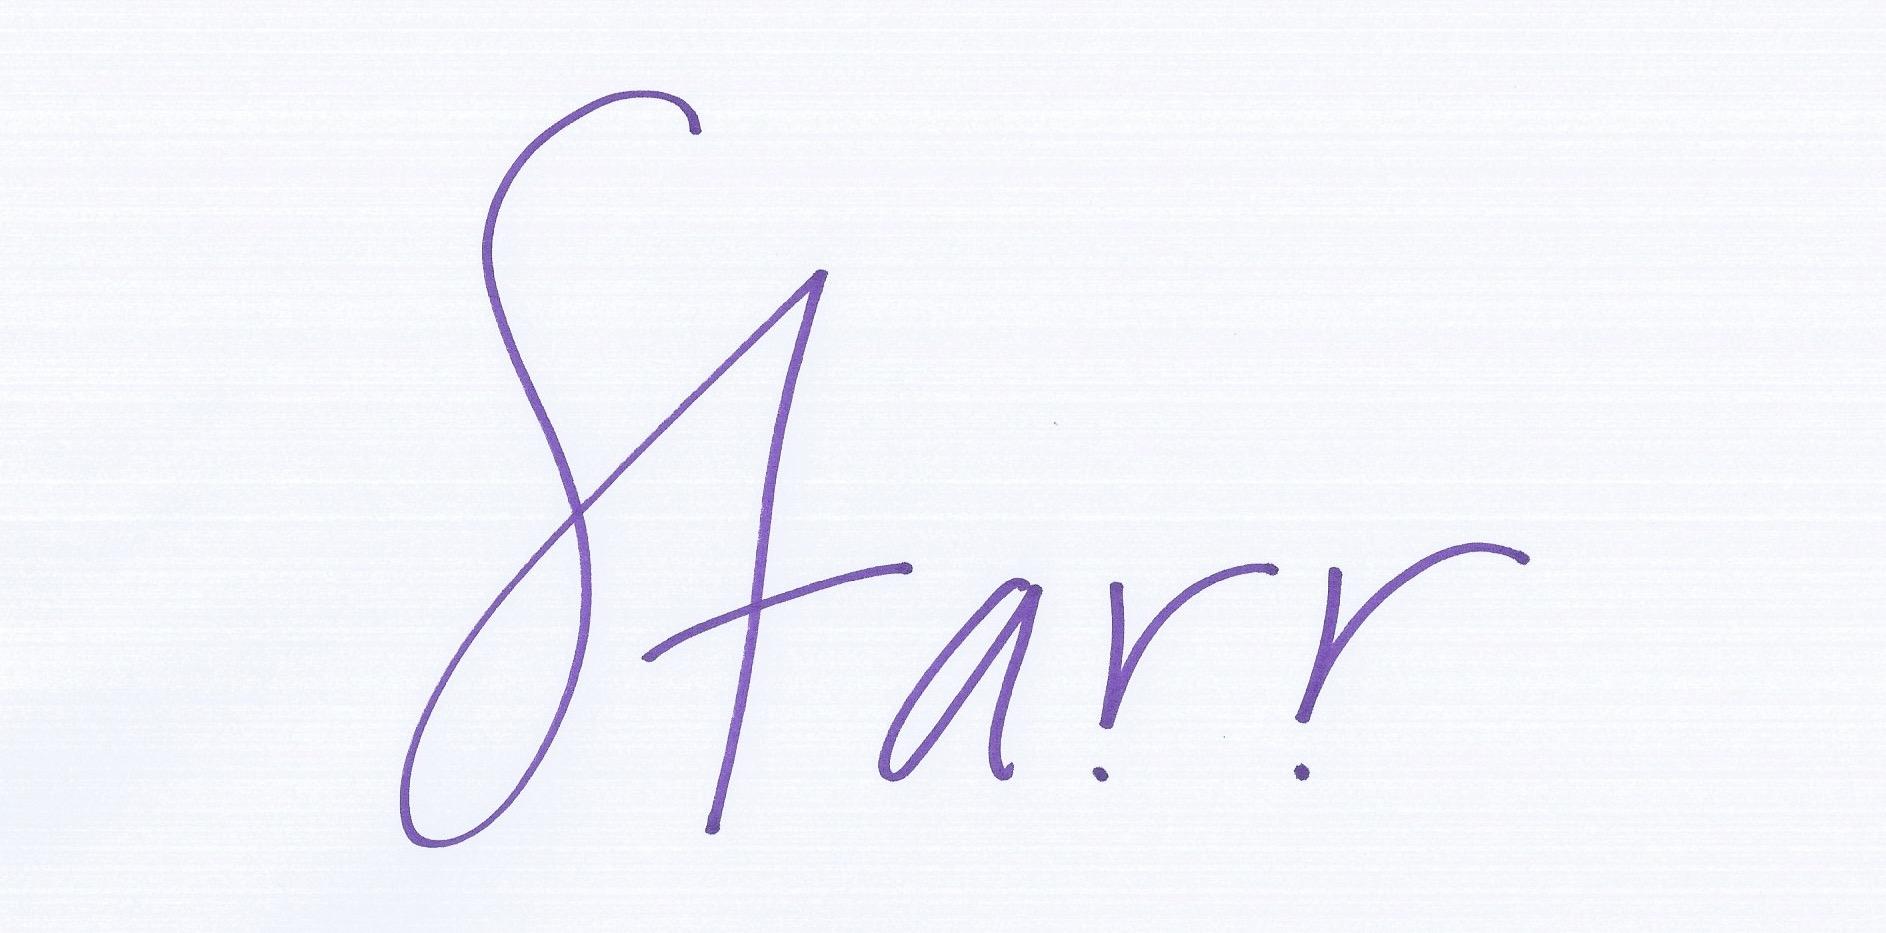 Starr Lowe Signature